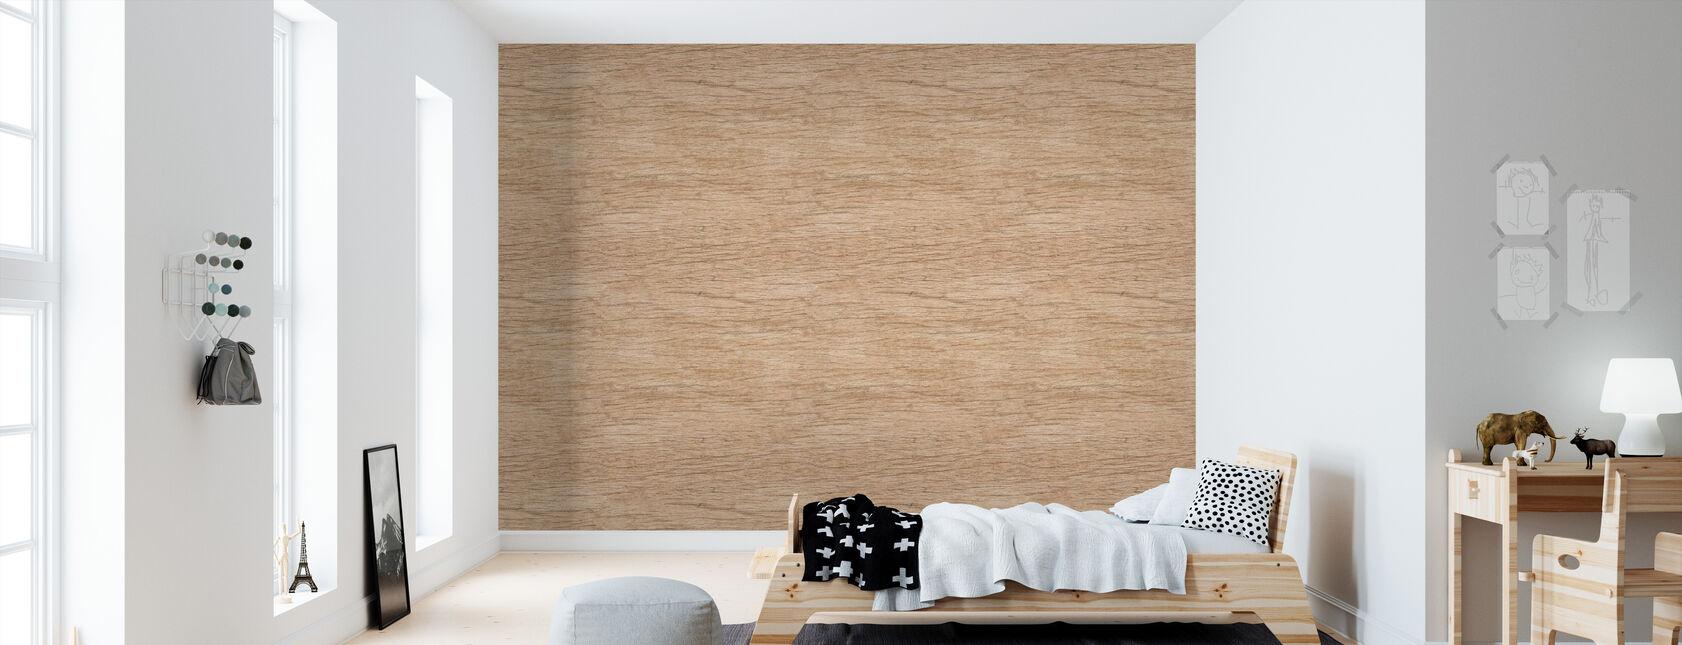 Baan Tawai hout textuur - Behang - Kinderkamer